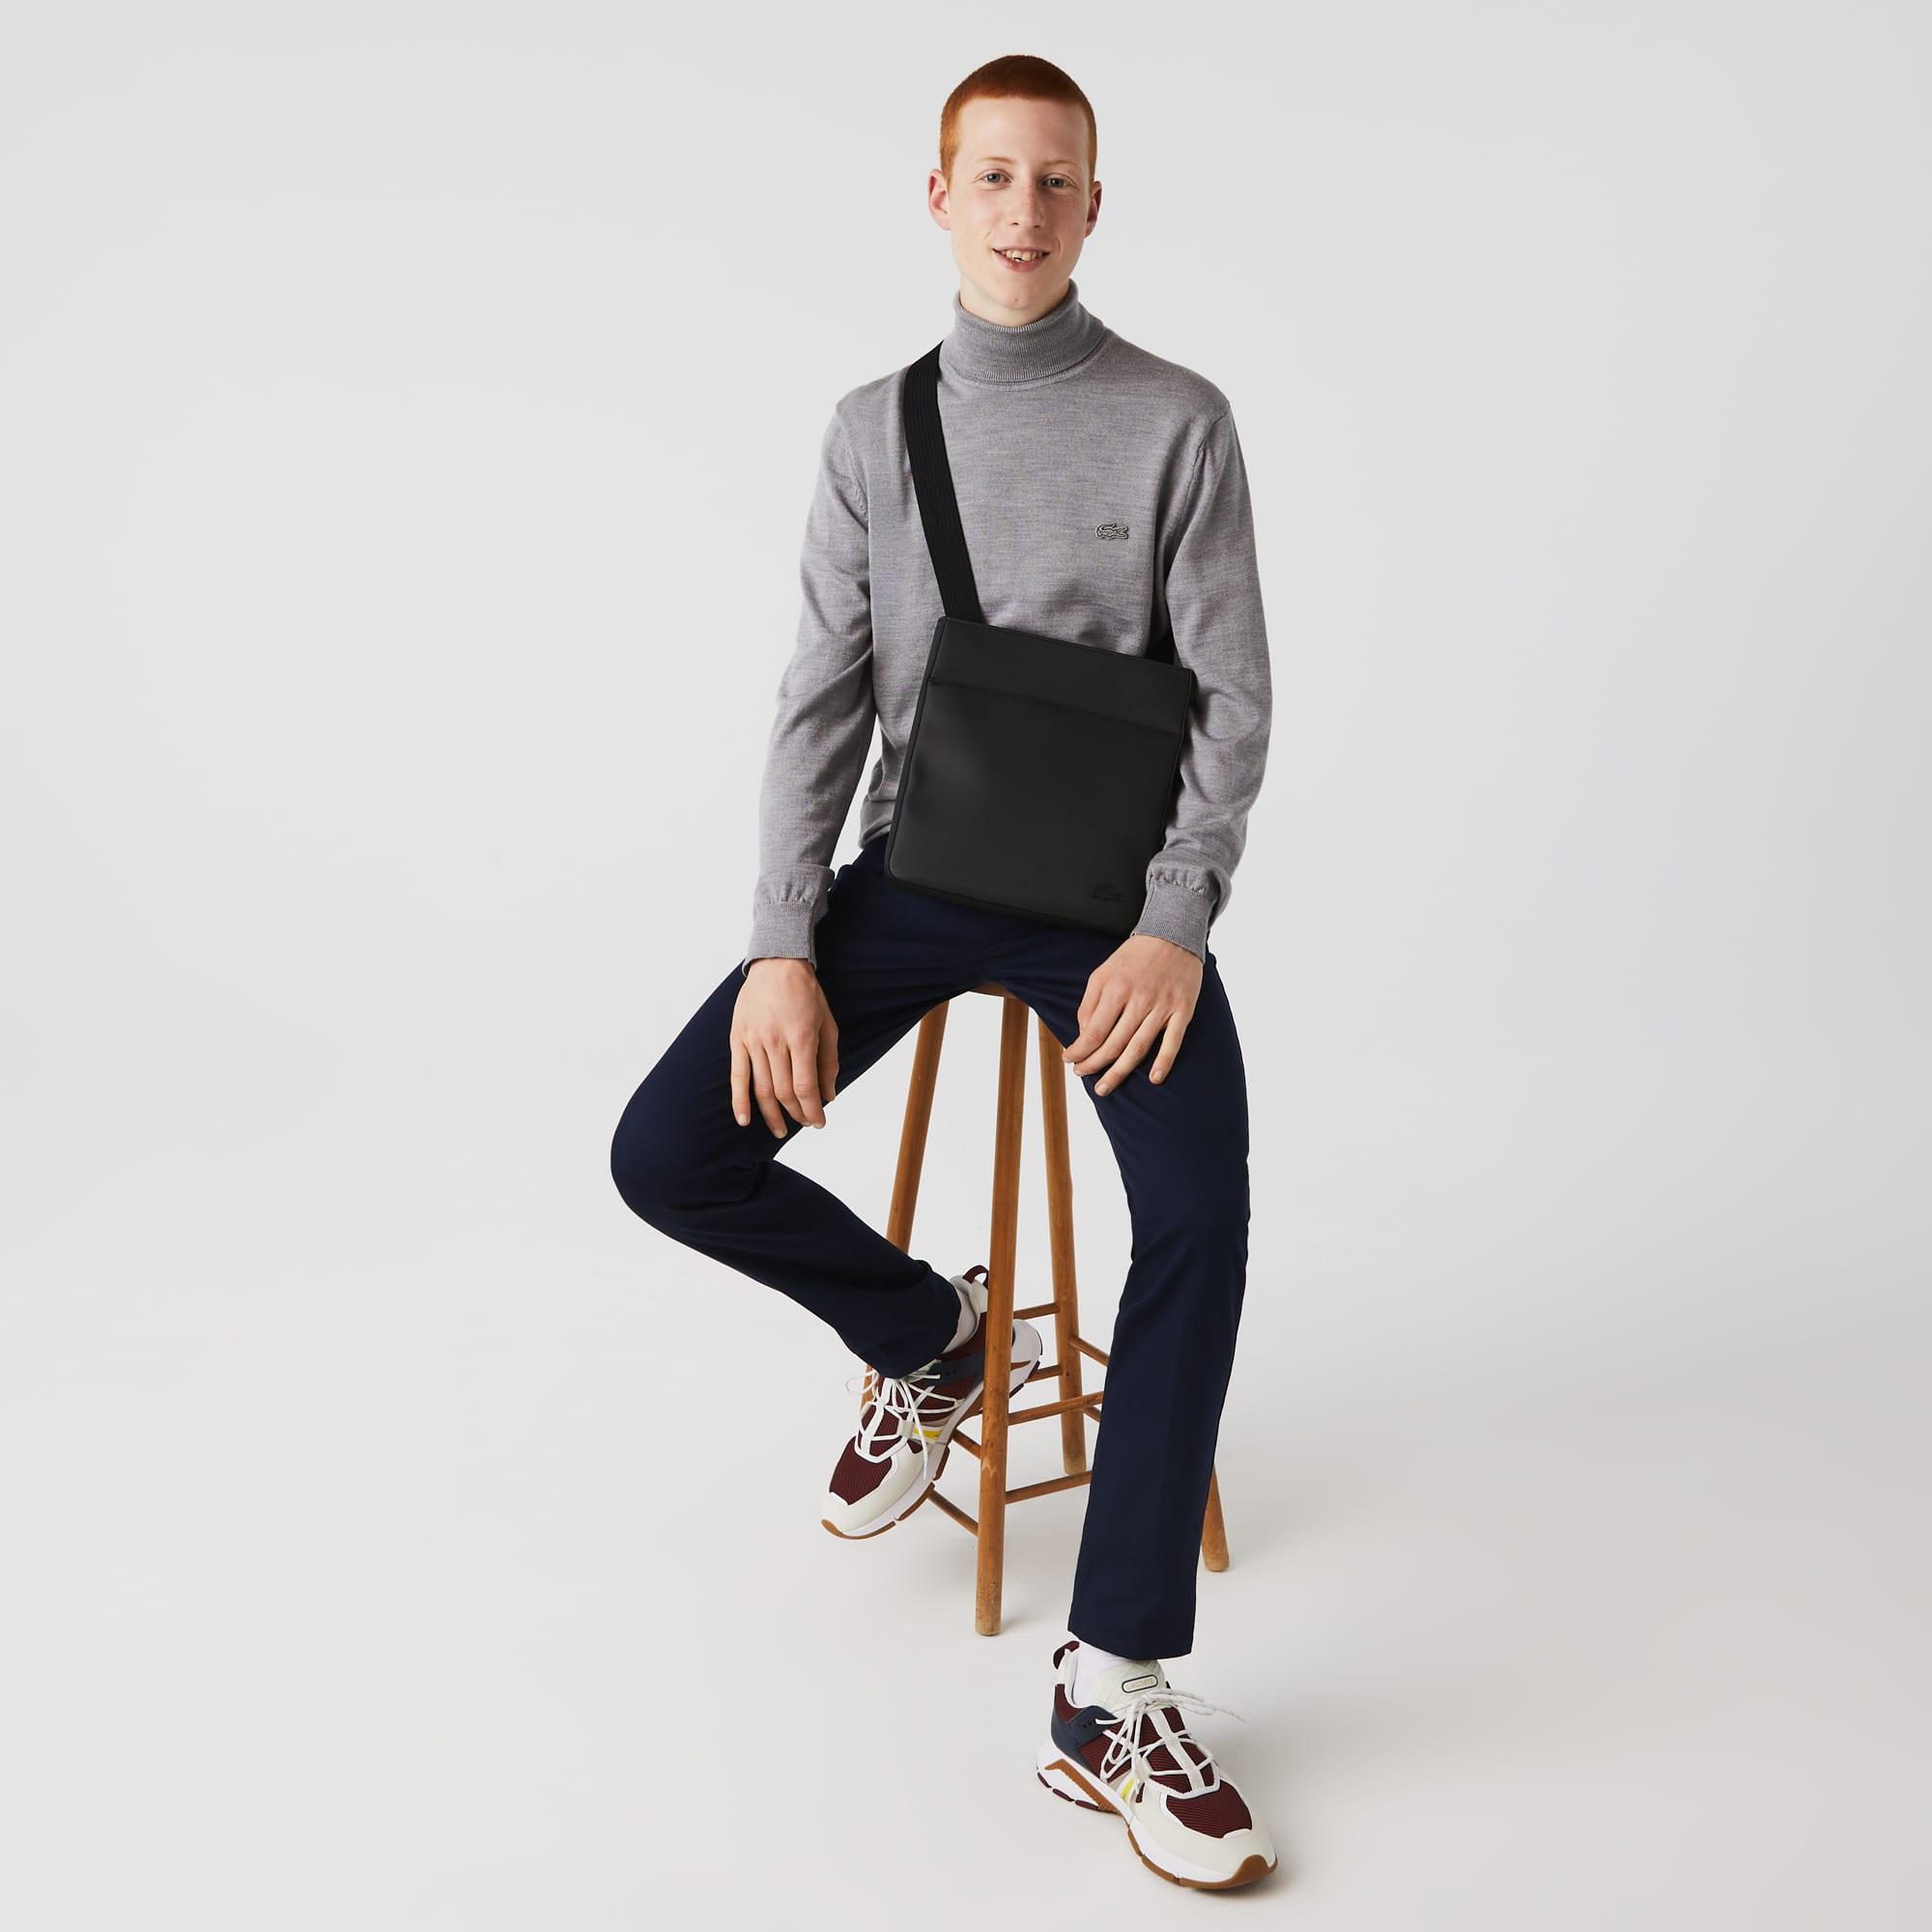 baf8f9e9477 Backpacks & Bags for men | Leather goods | LACOSTE